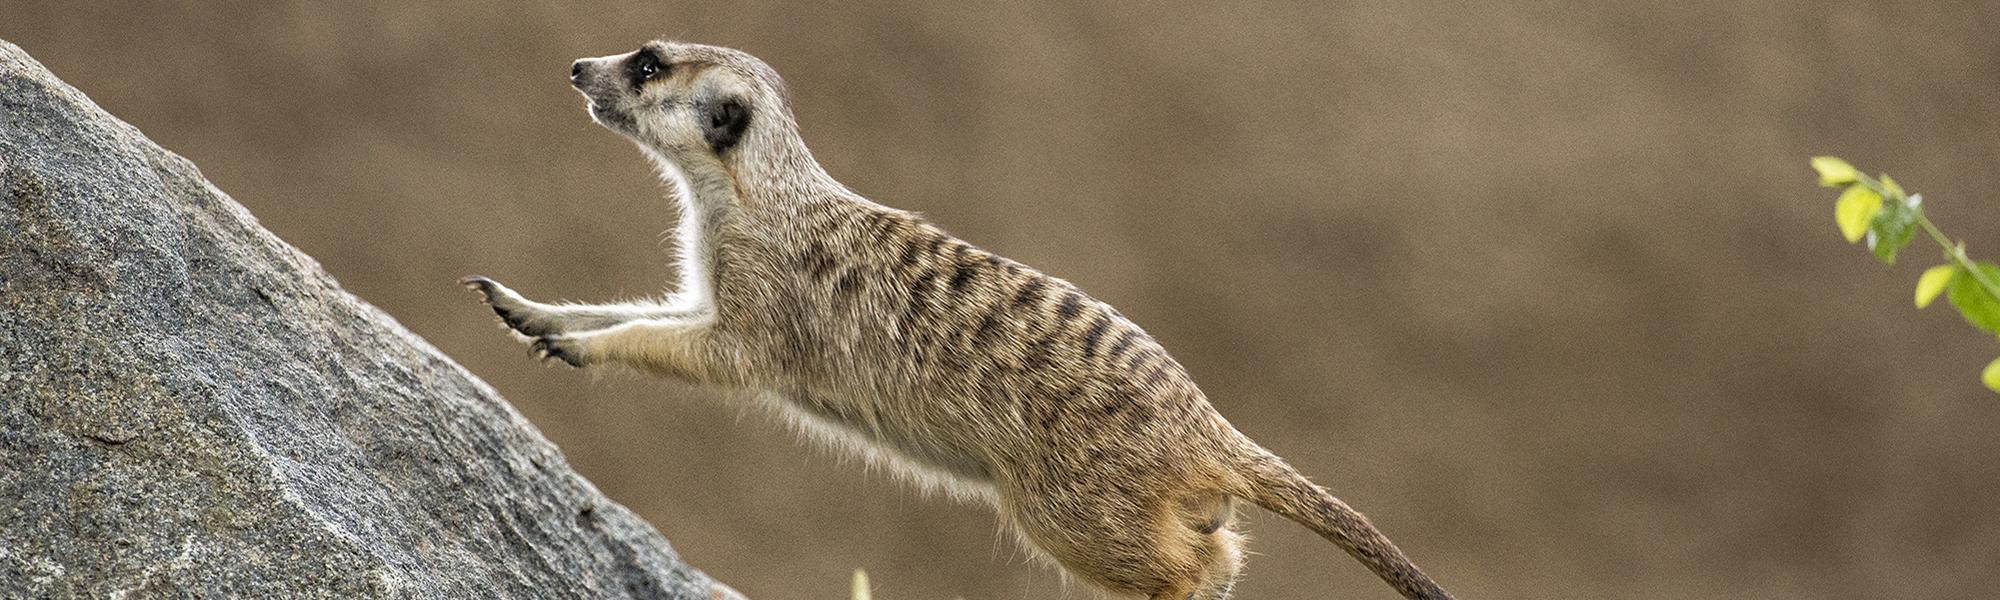 Meerkat3b